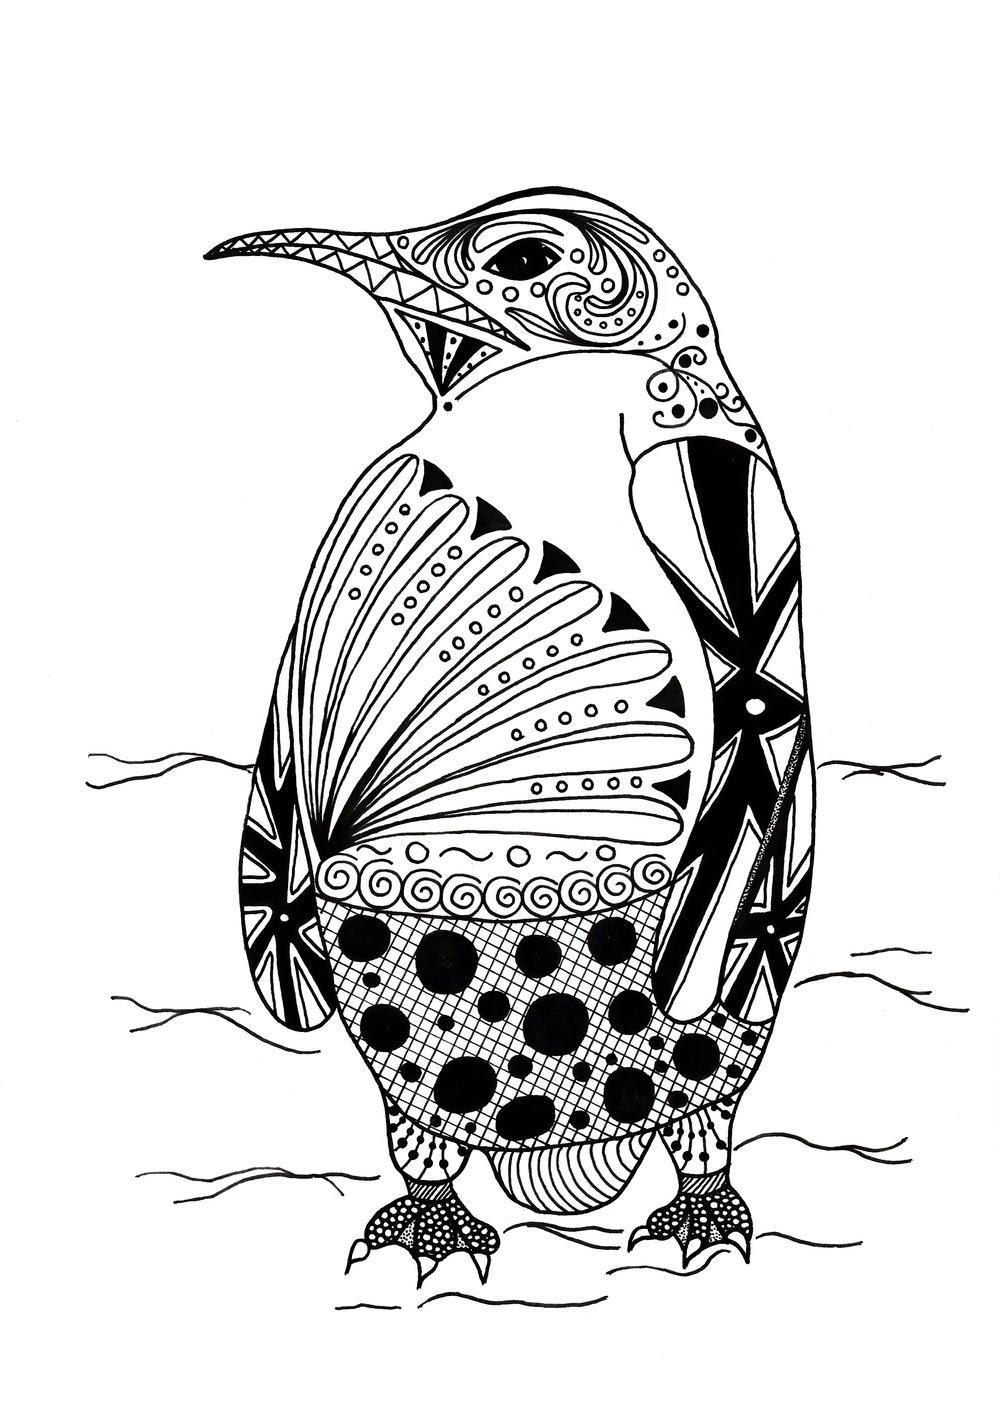 Intricate Penguin Adult Coloring Page | FaveCrafts.com